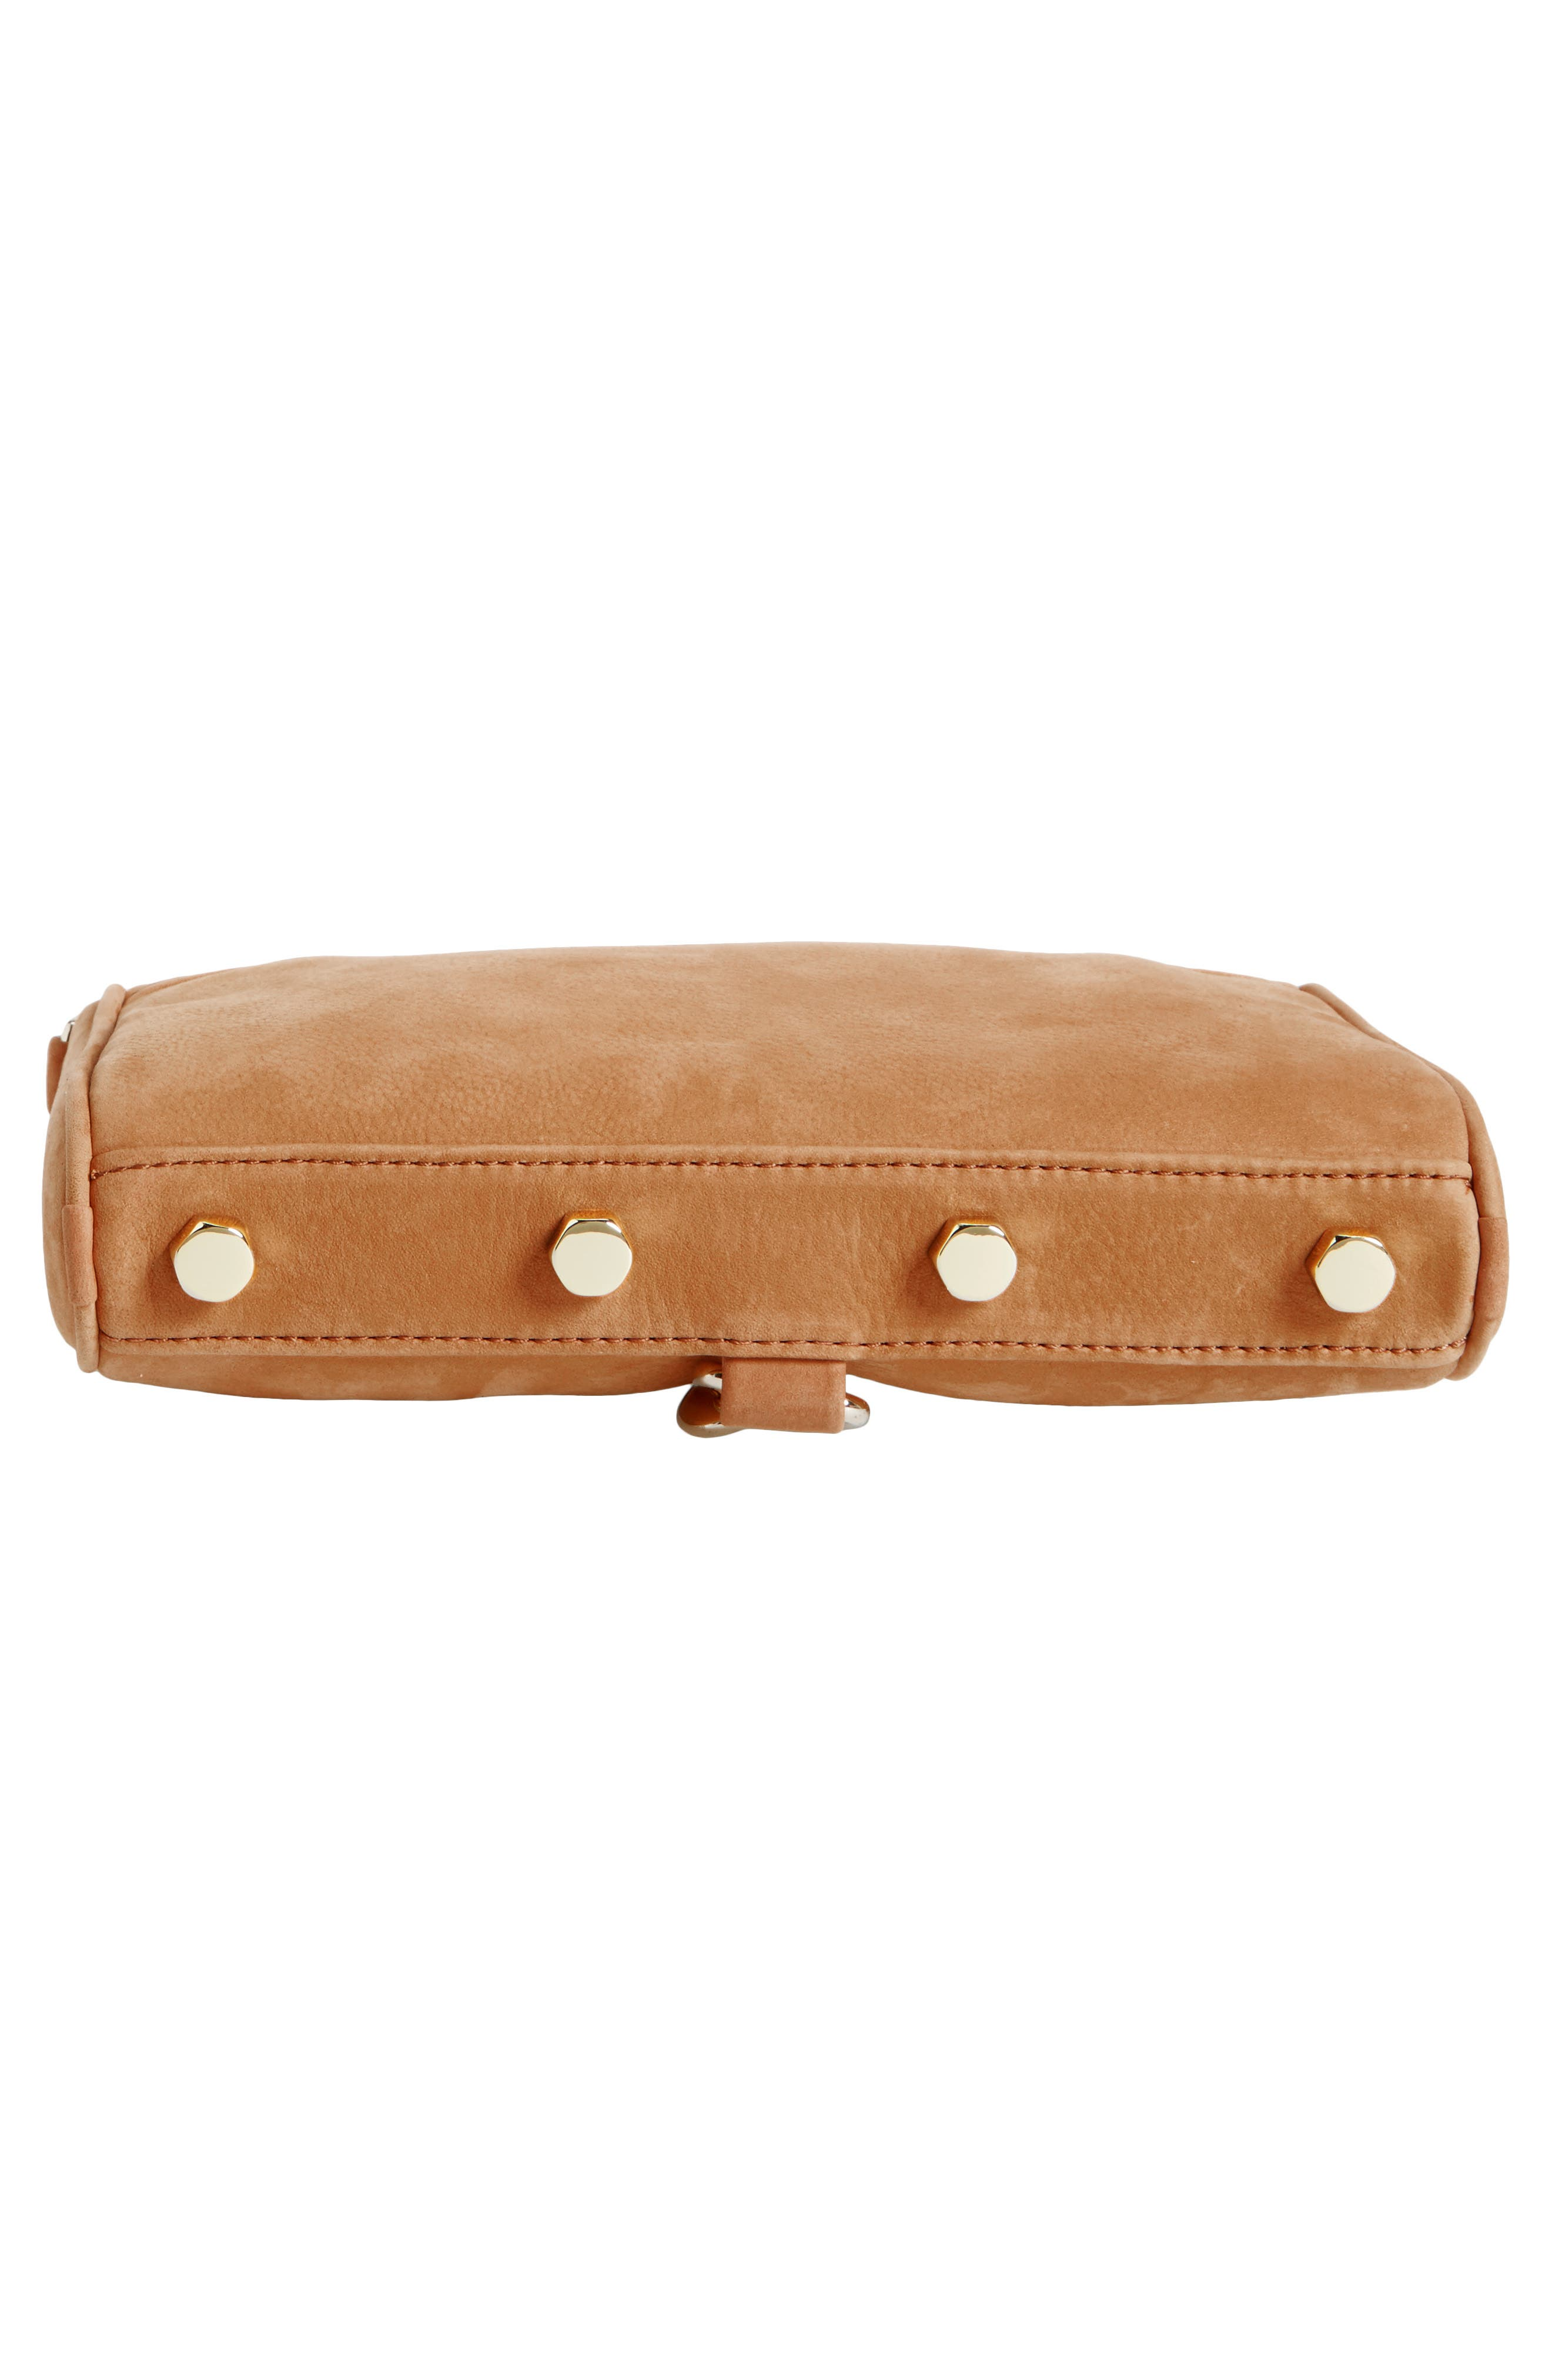 Mini MAC Convertible Crossbody Bag,                             Alternate thumbnail 6, color,                             Almond